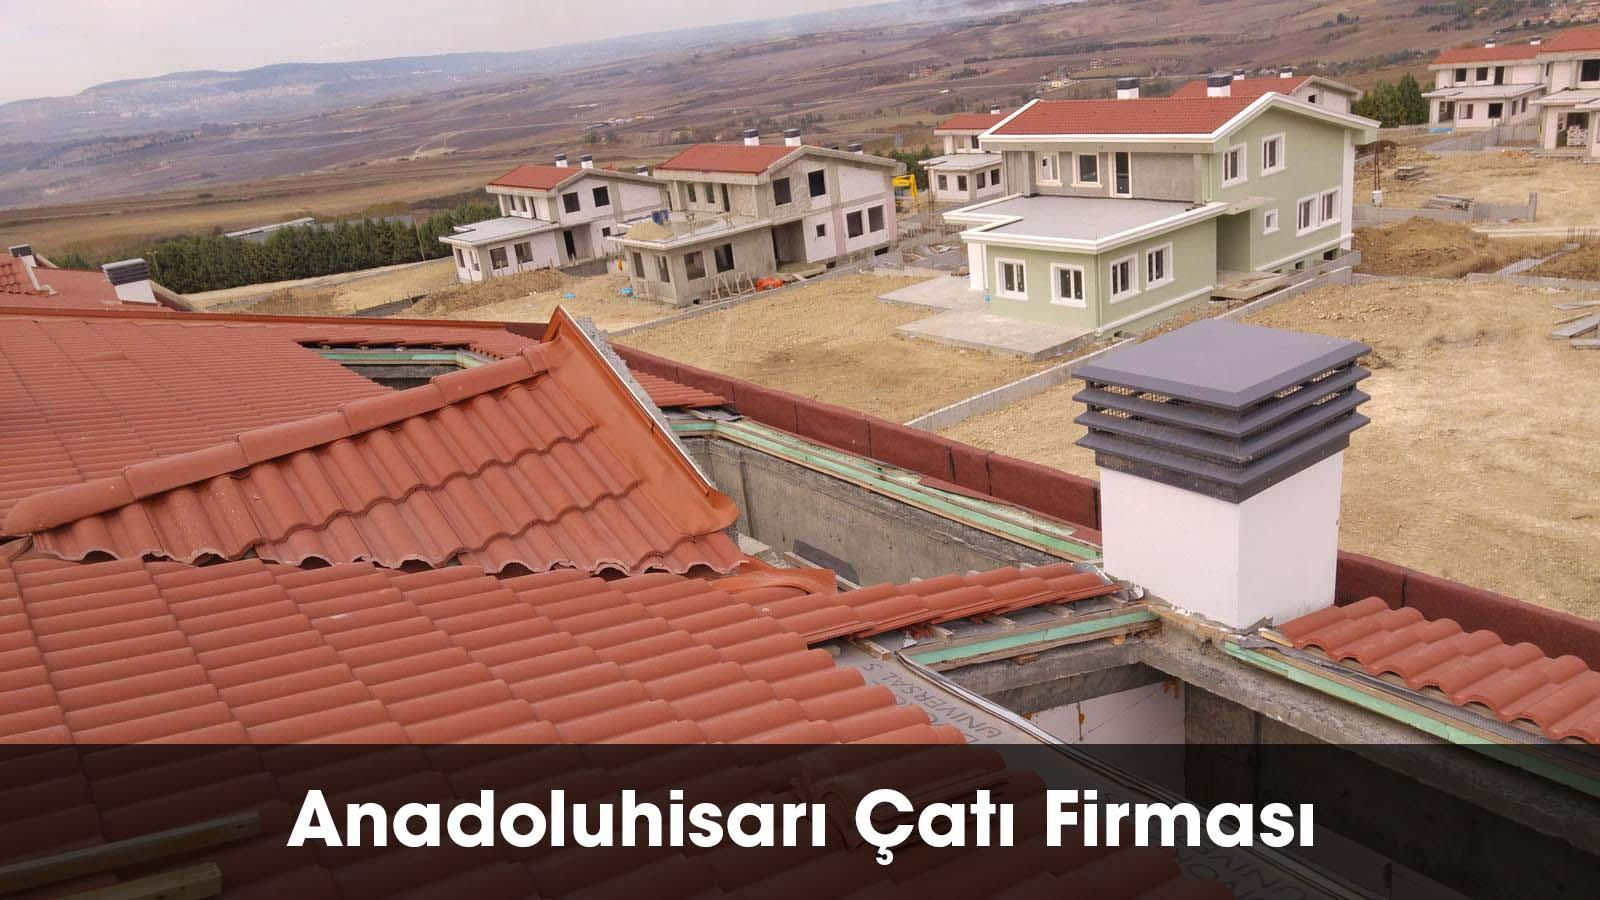 Anadoluhisarı çatı firması